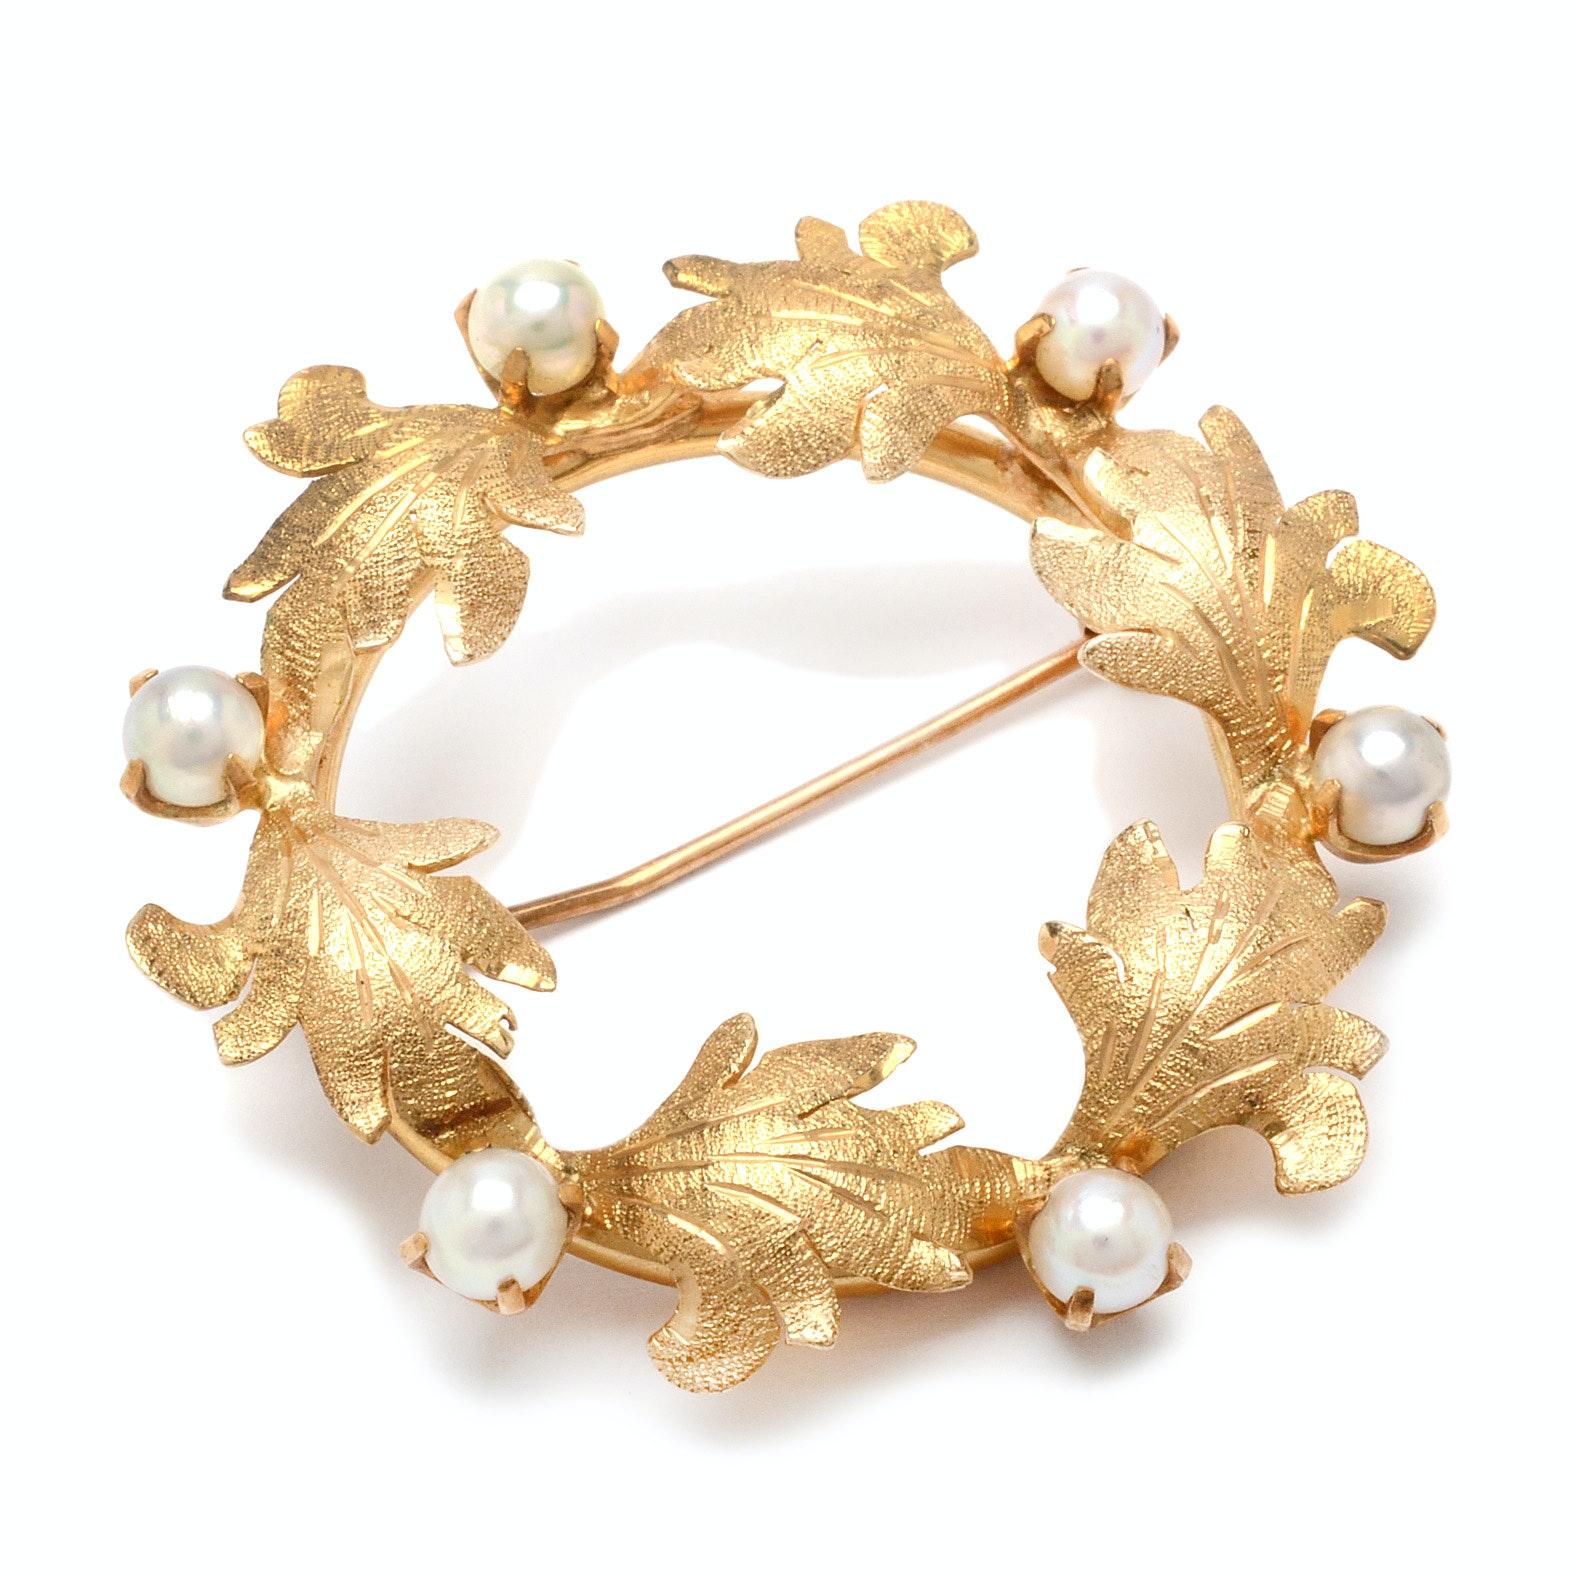 14K Gold Pearl Wreath Brooch